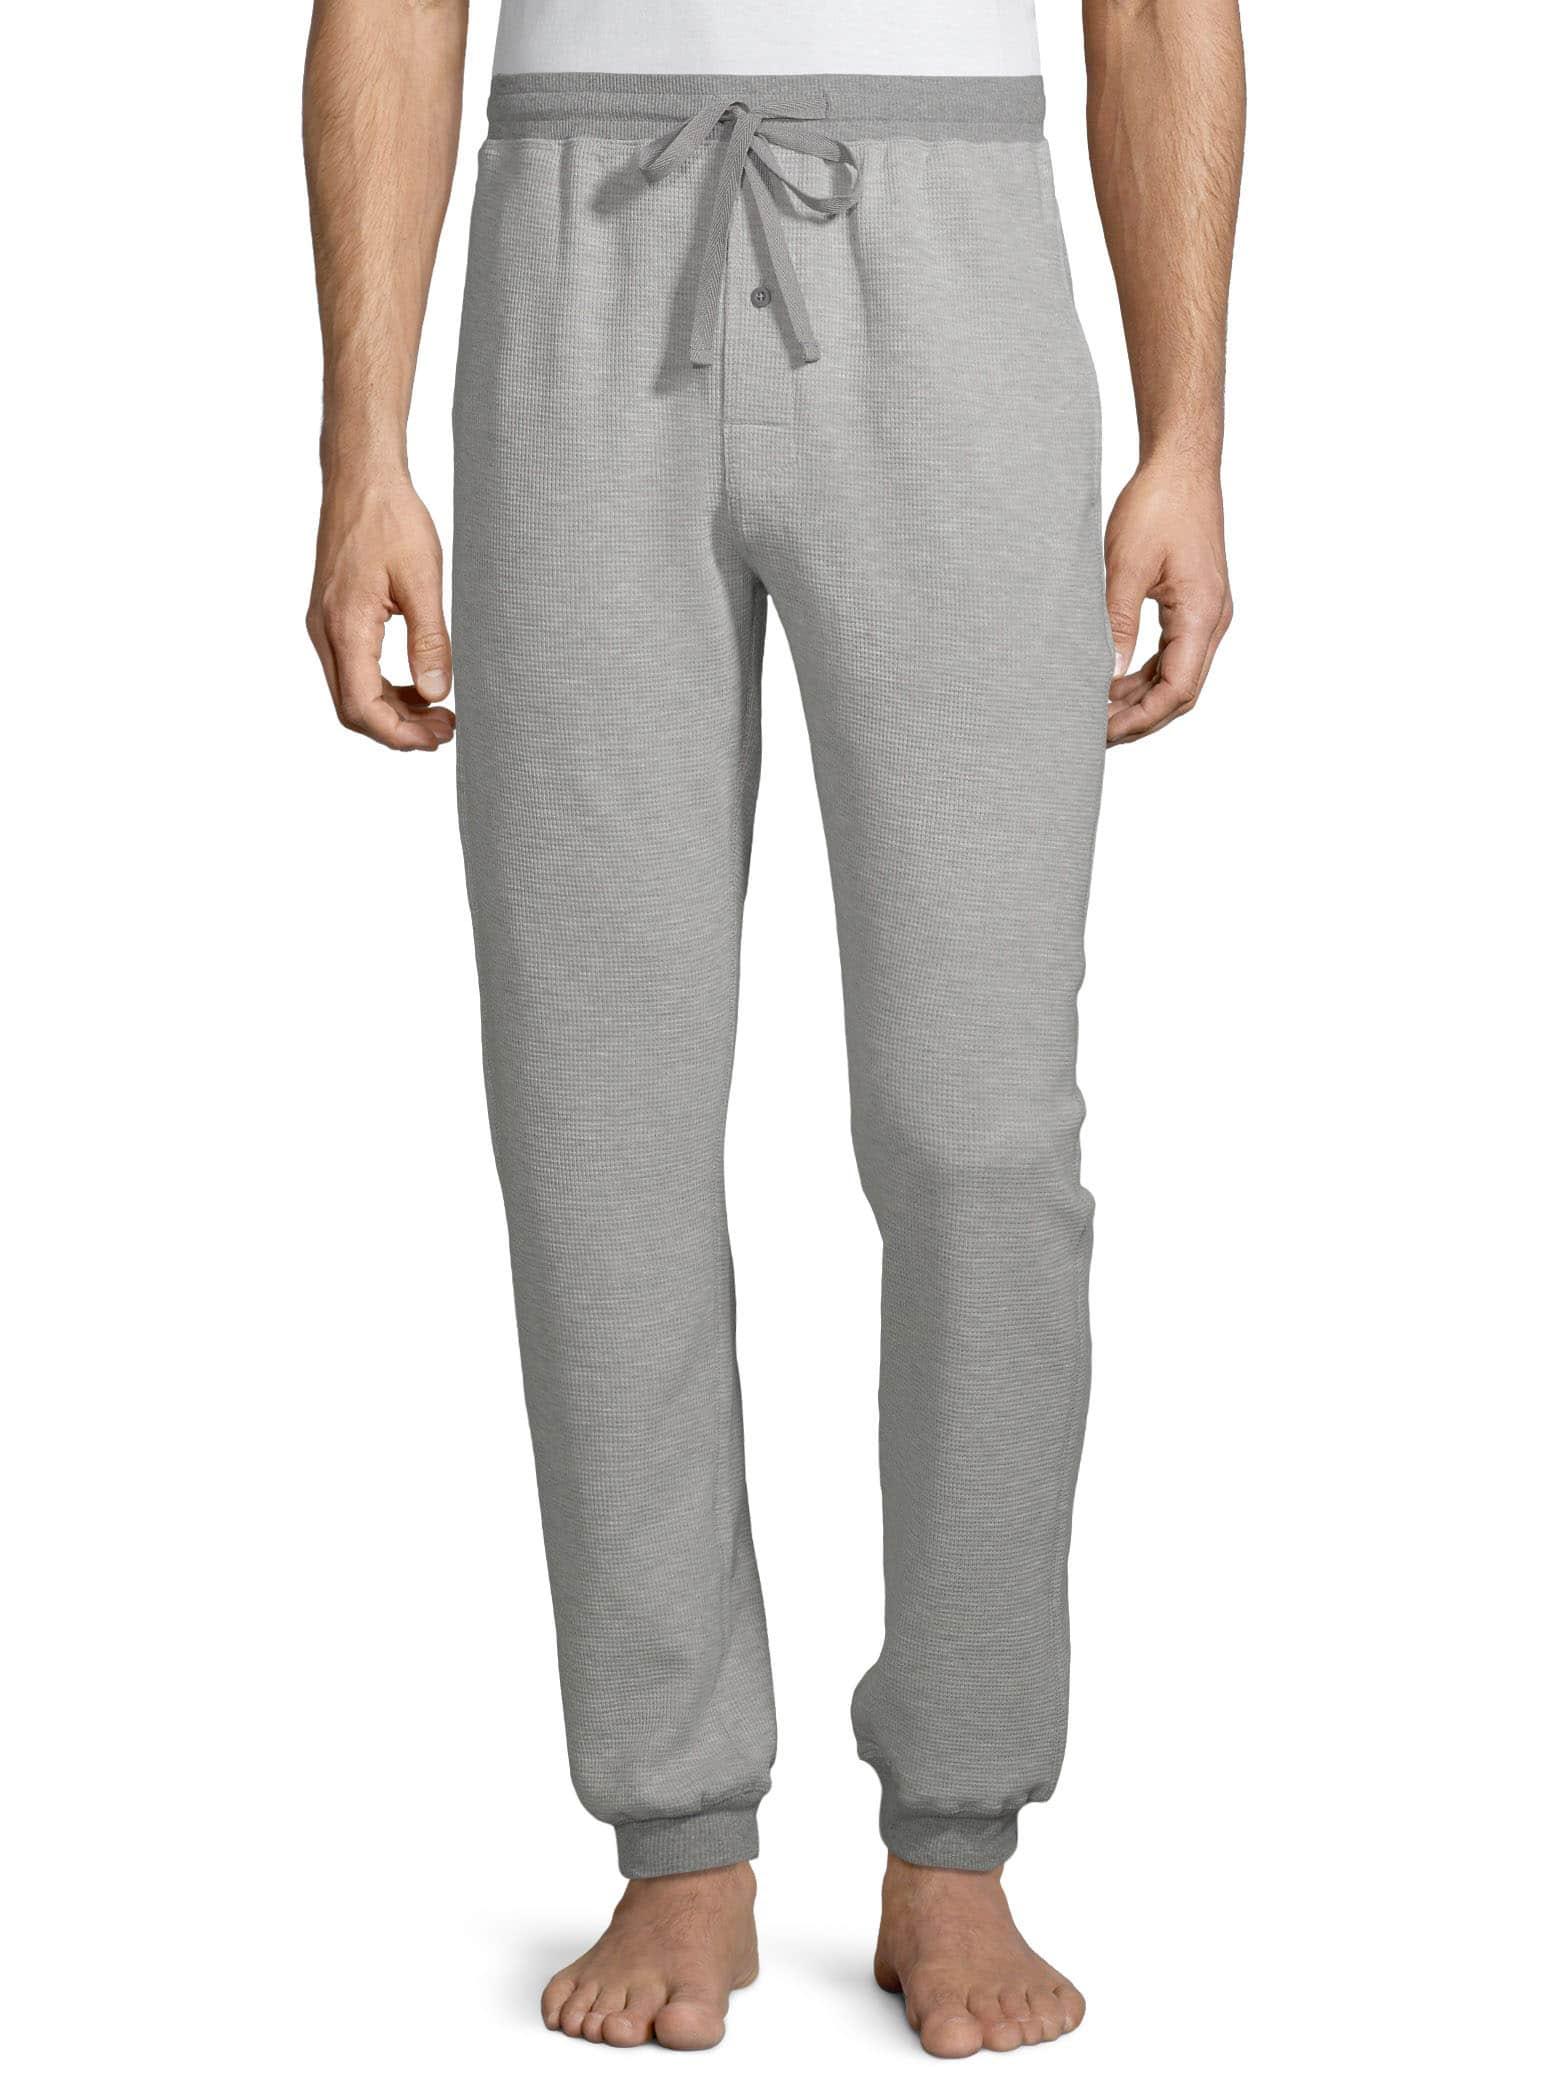 Men's Apparel: Graphic Tee $6, Hanes Waffle Jogger Pants